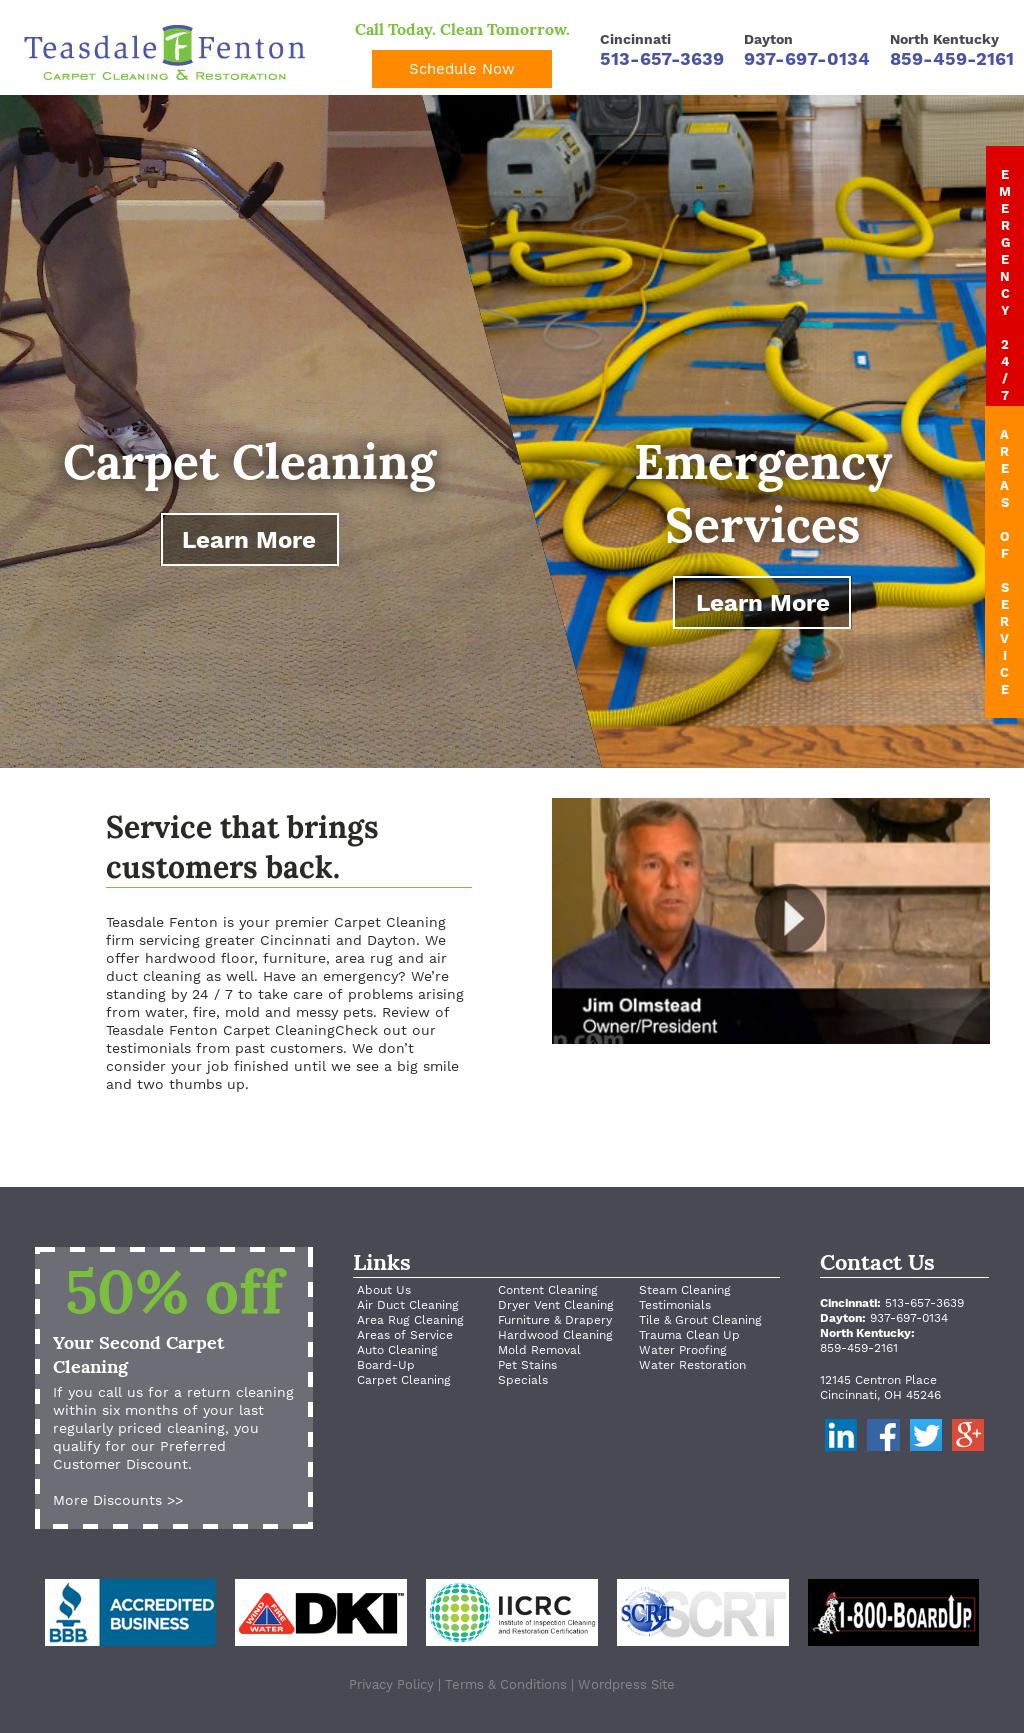 Teasdale Fenton Restoration's website screenshot on Dec 2016